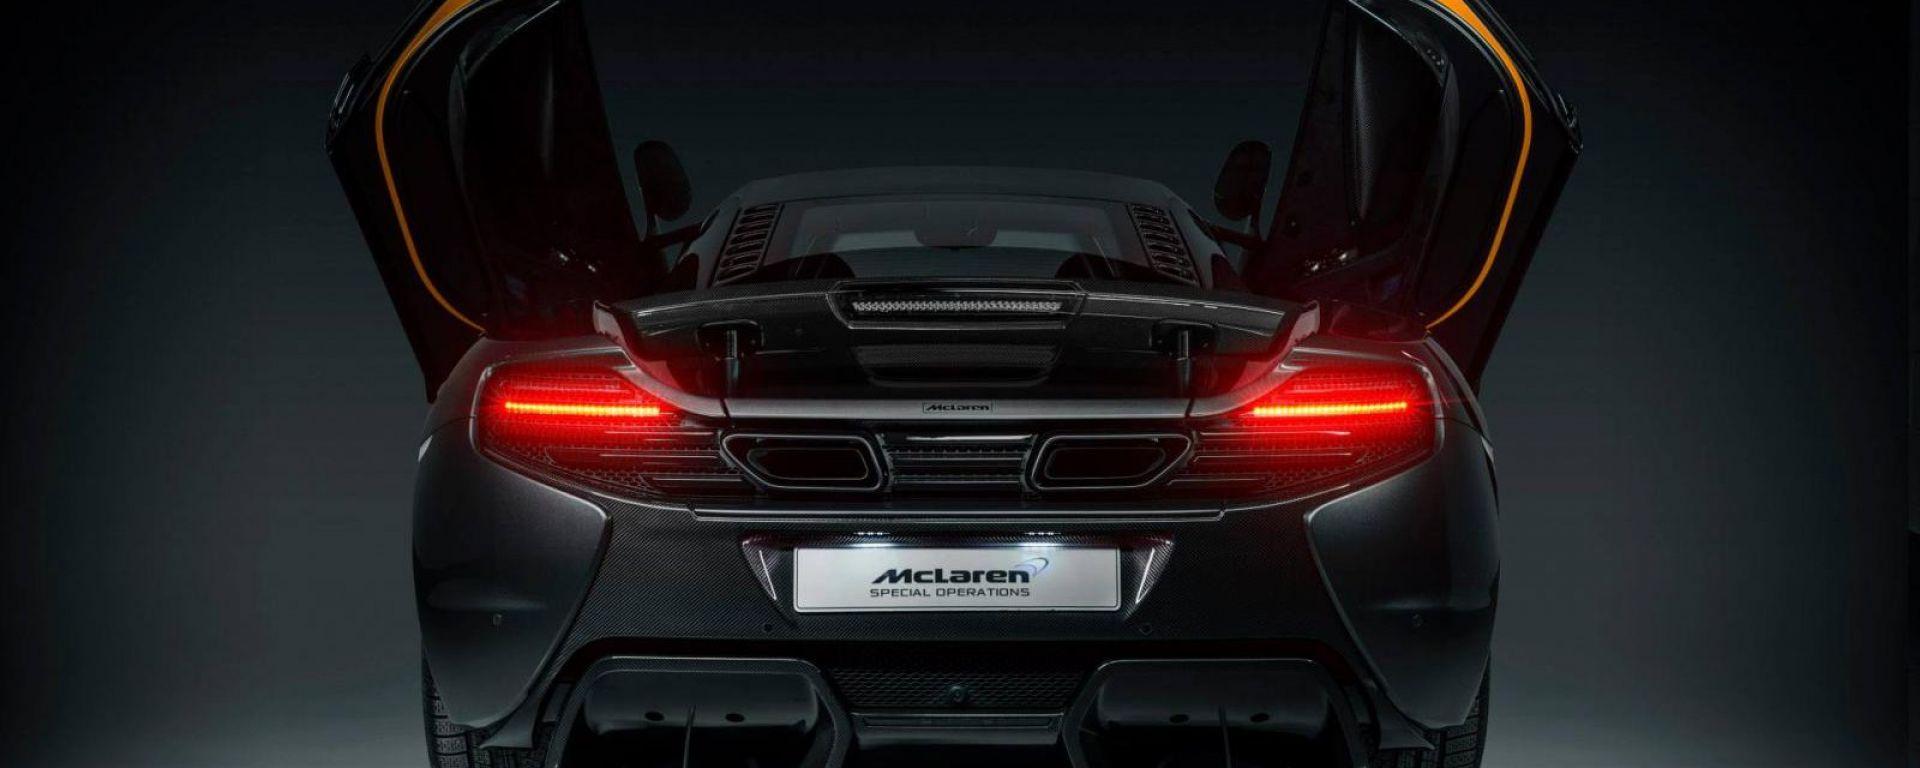 MSO McLaren 650S Project Kilo